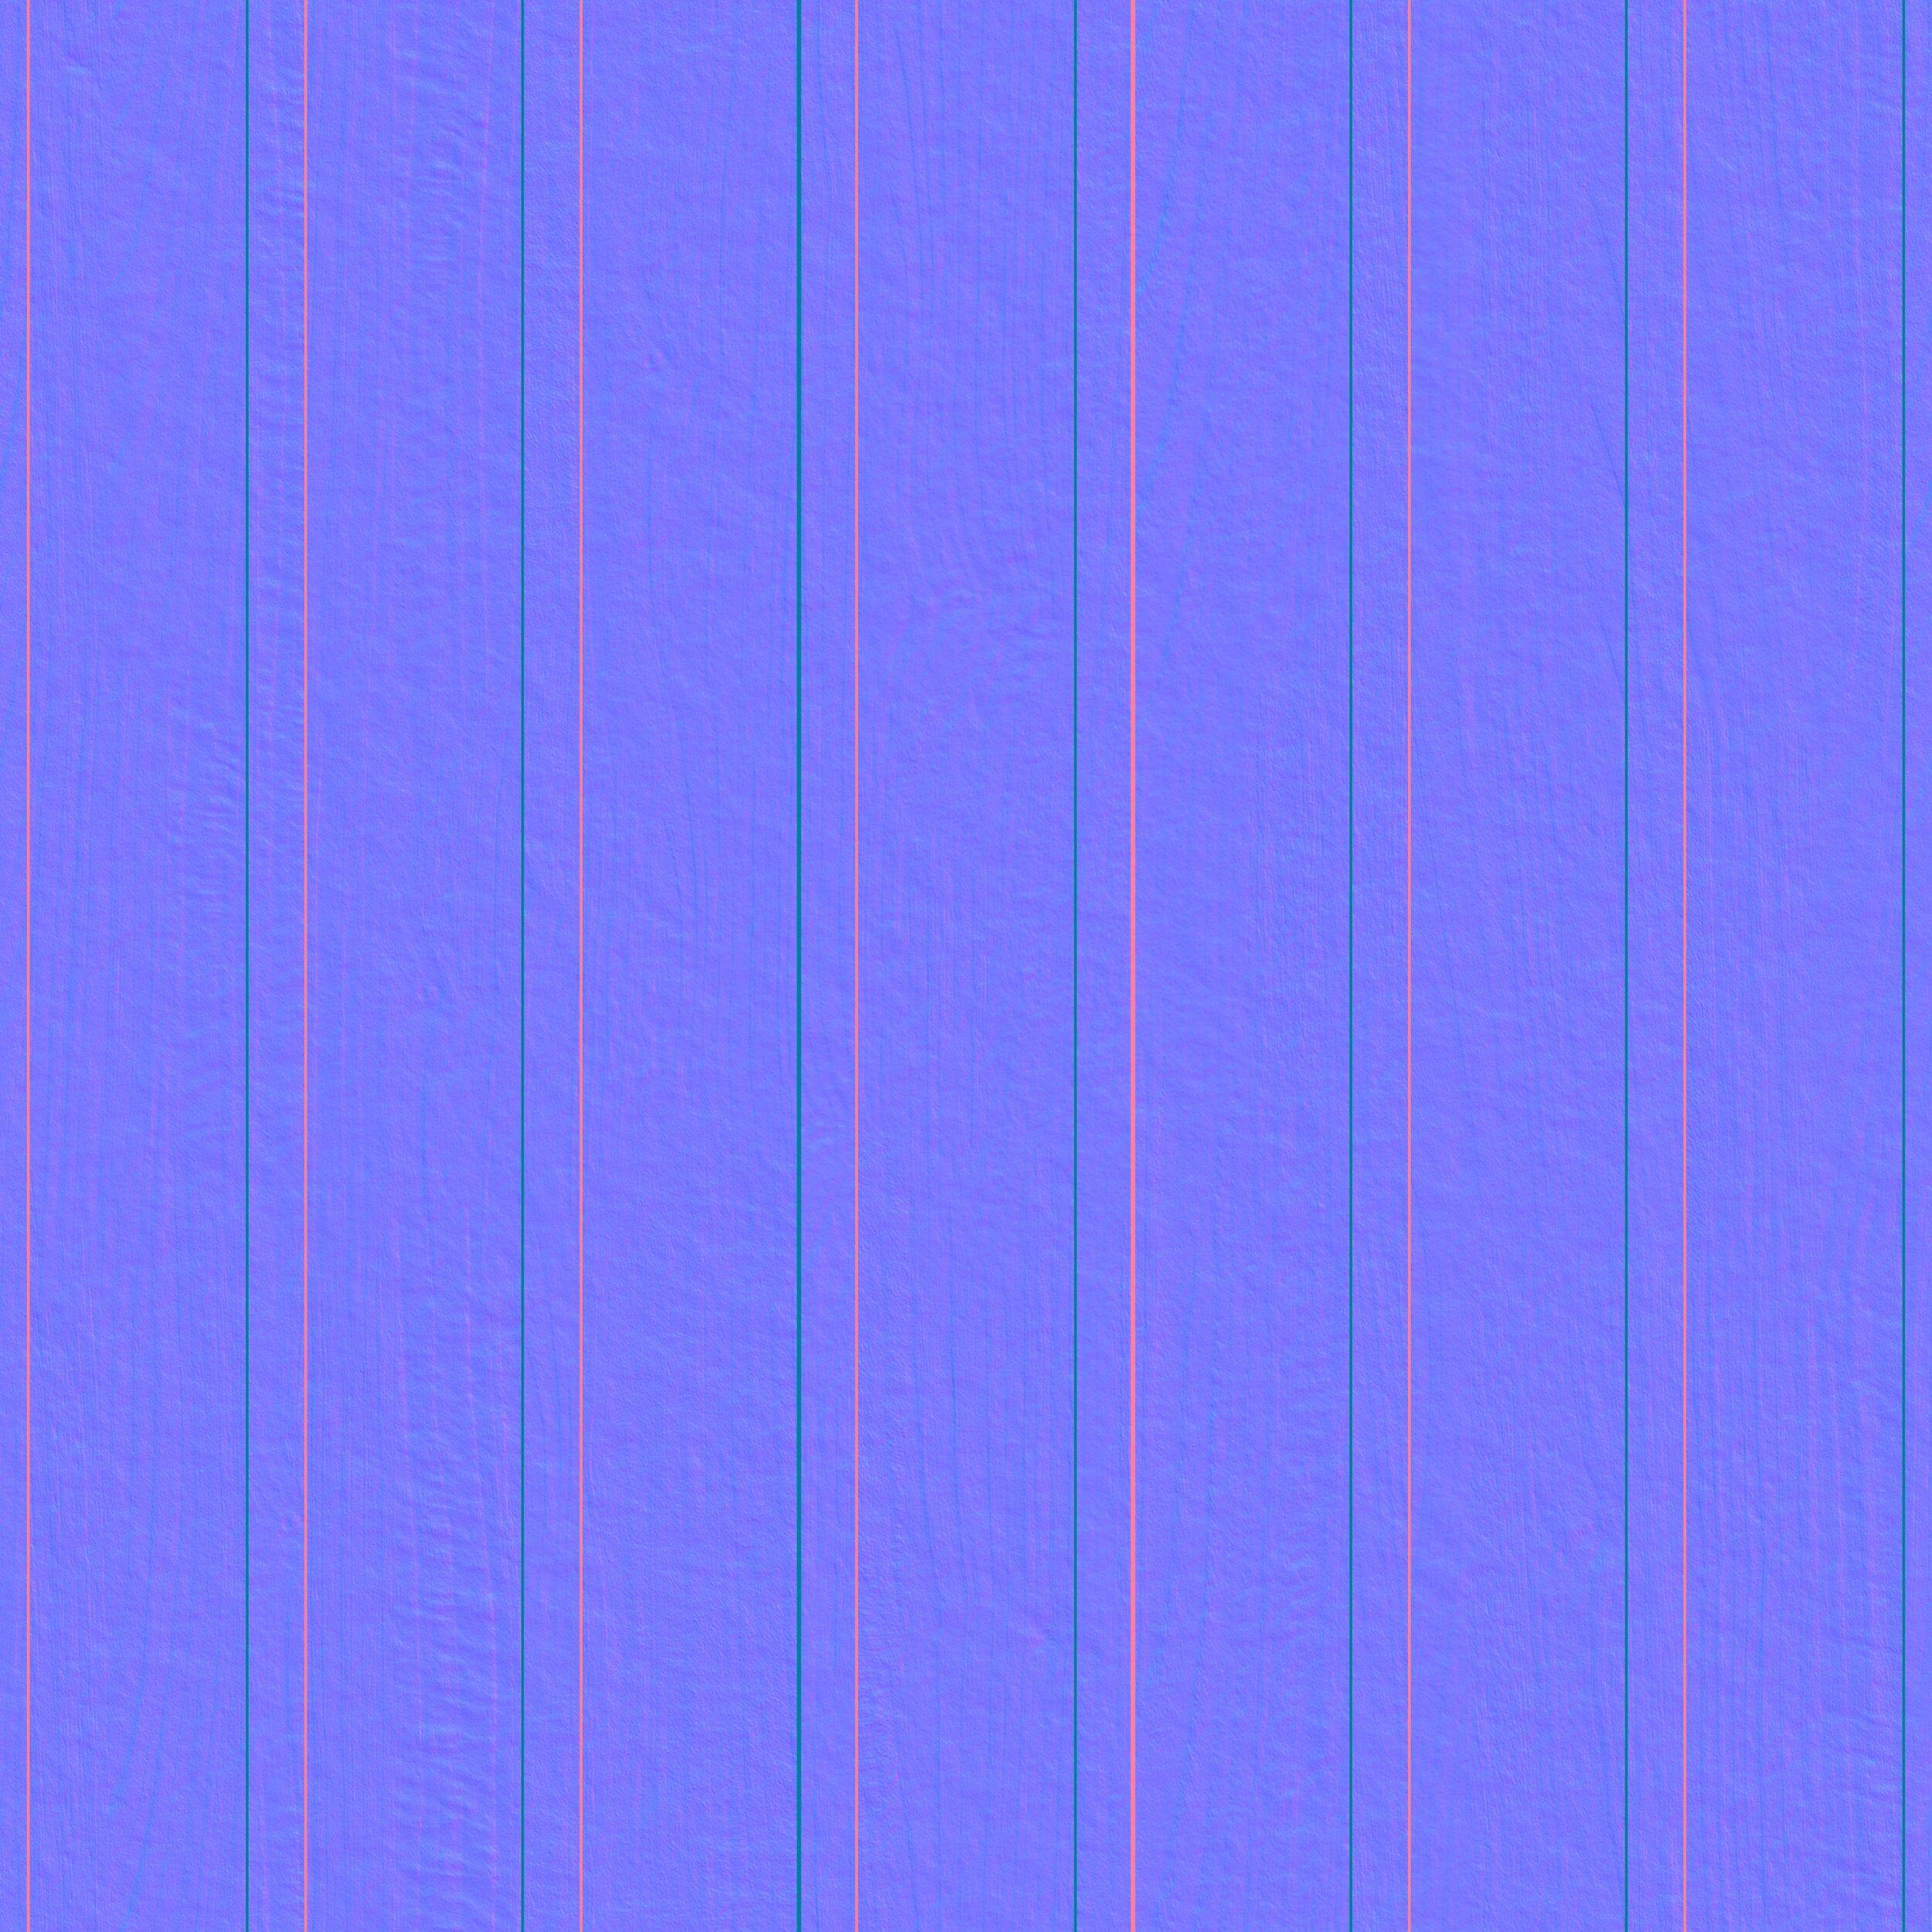 Siding_AI_01B_White_NRM.jpg